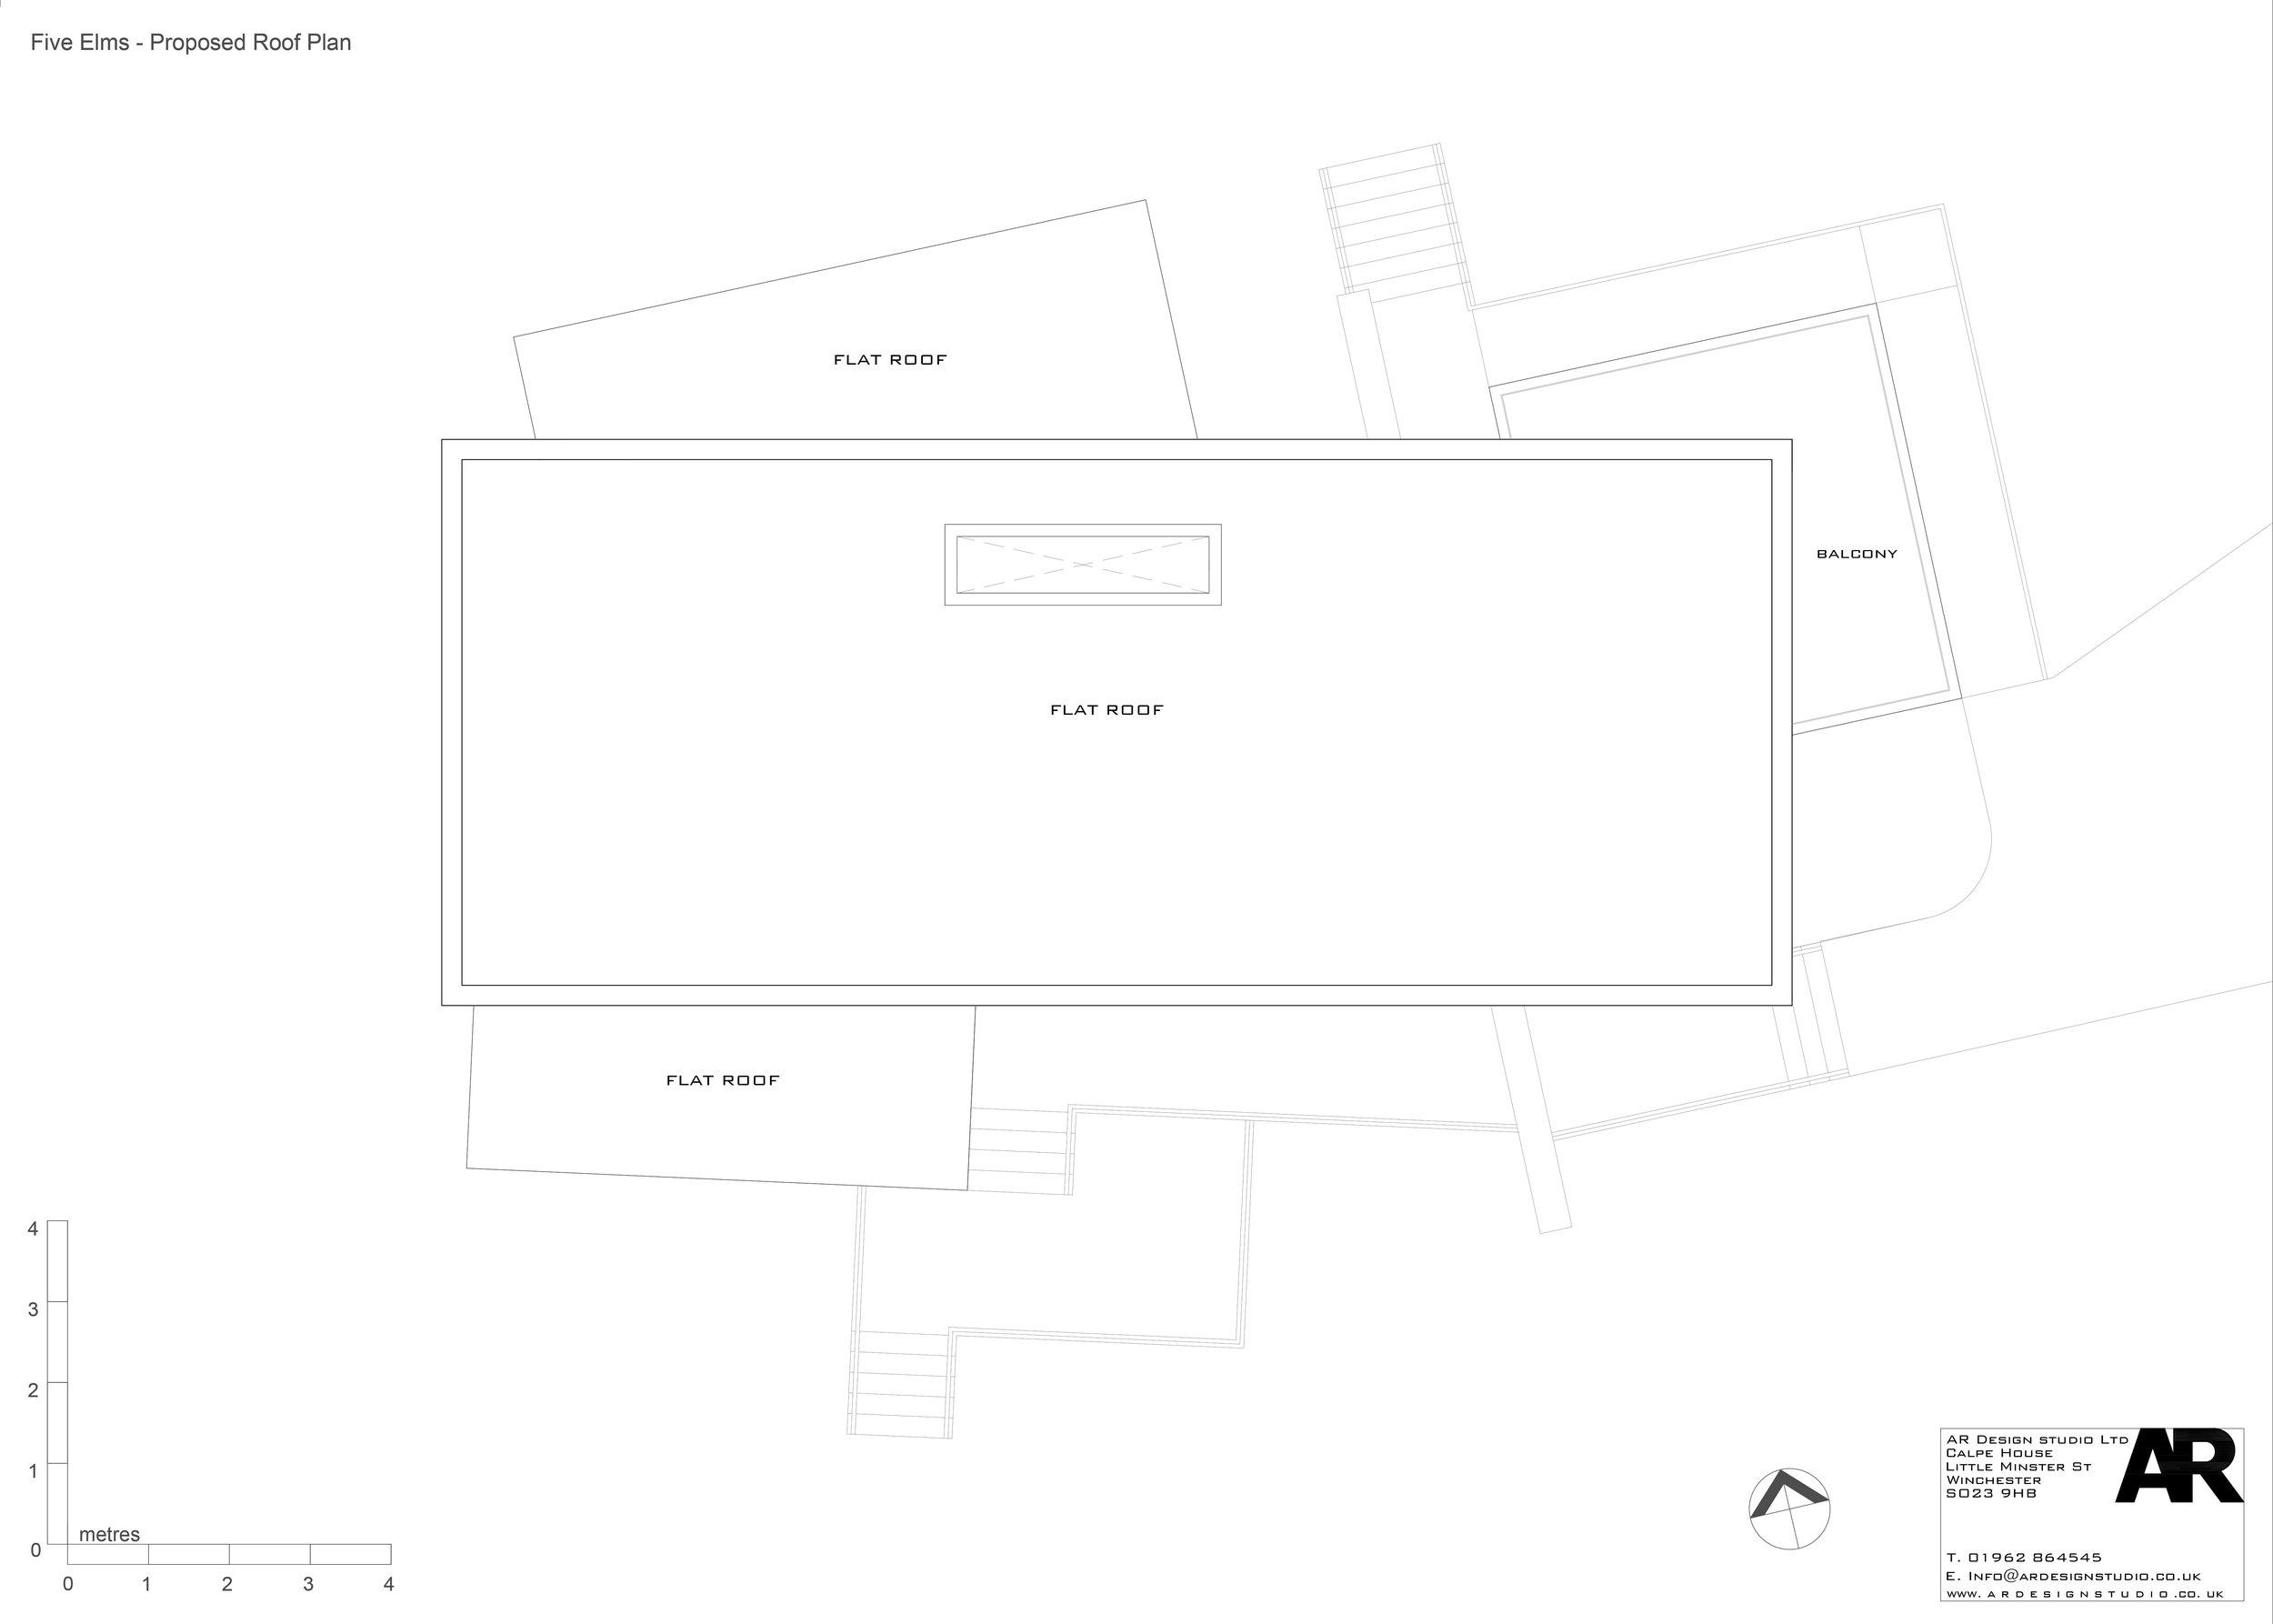 Five Elms Roof Plan